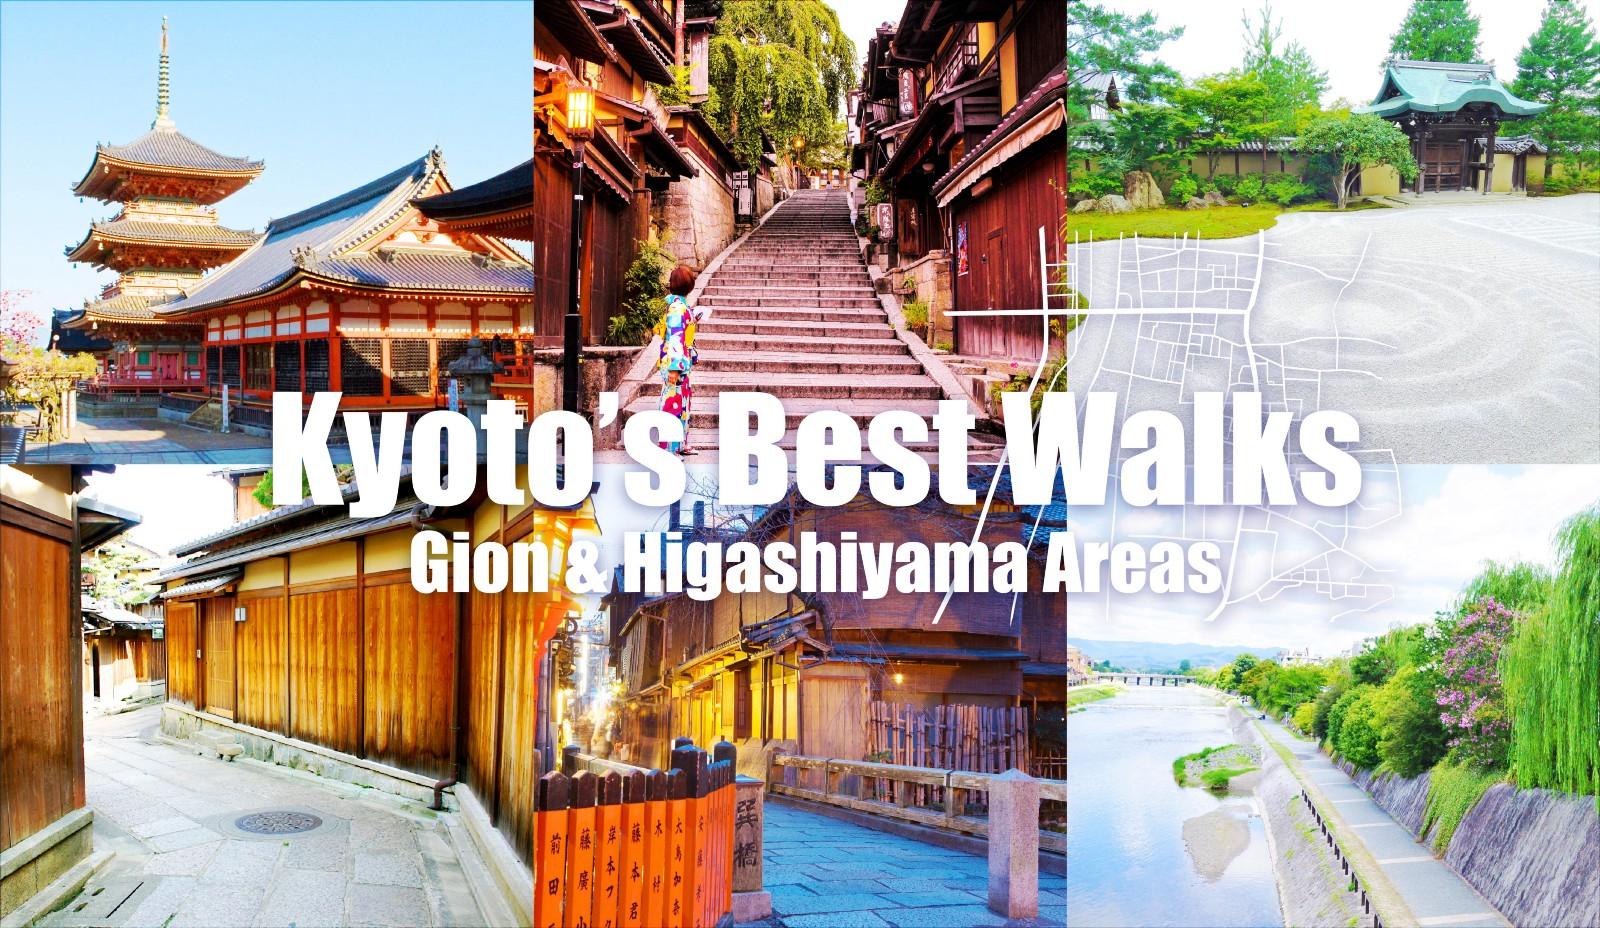 1 Day Itinerary in Kyoto: Higashiyama and Gion